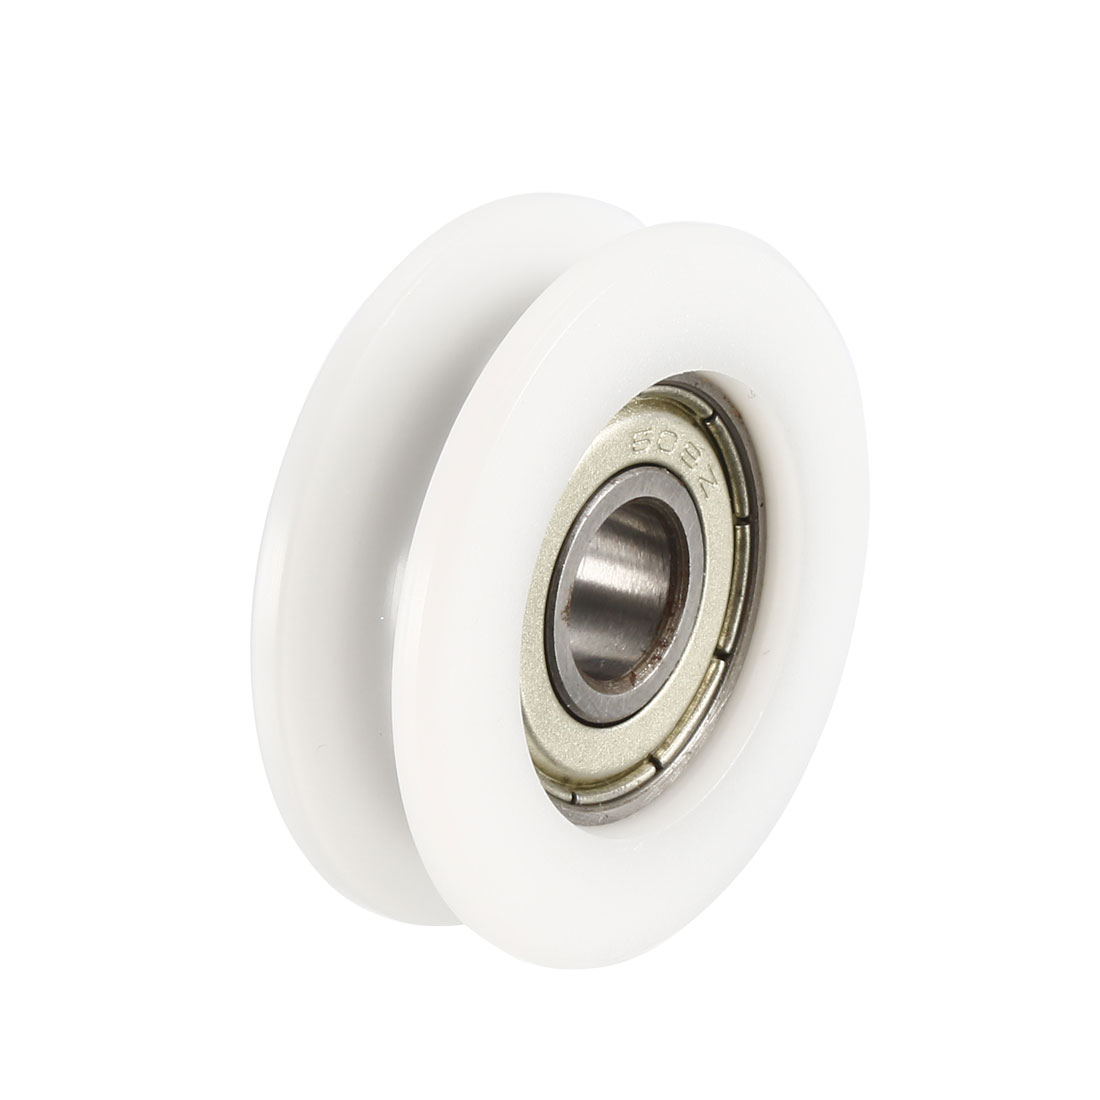 V Groove Guide Bearing Pulley Rail Ball Wheel White 8x34x11mm 4pcs